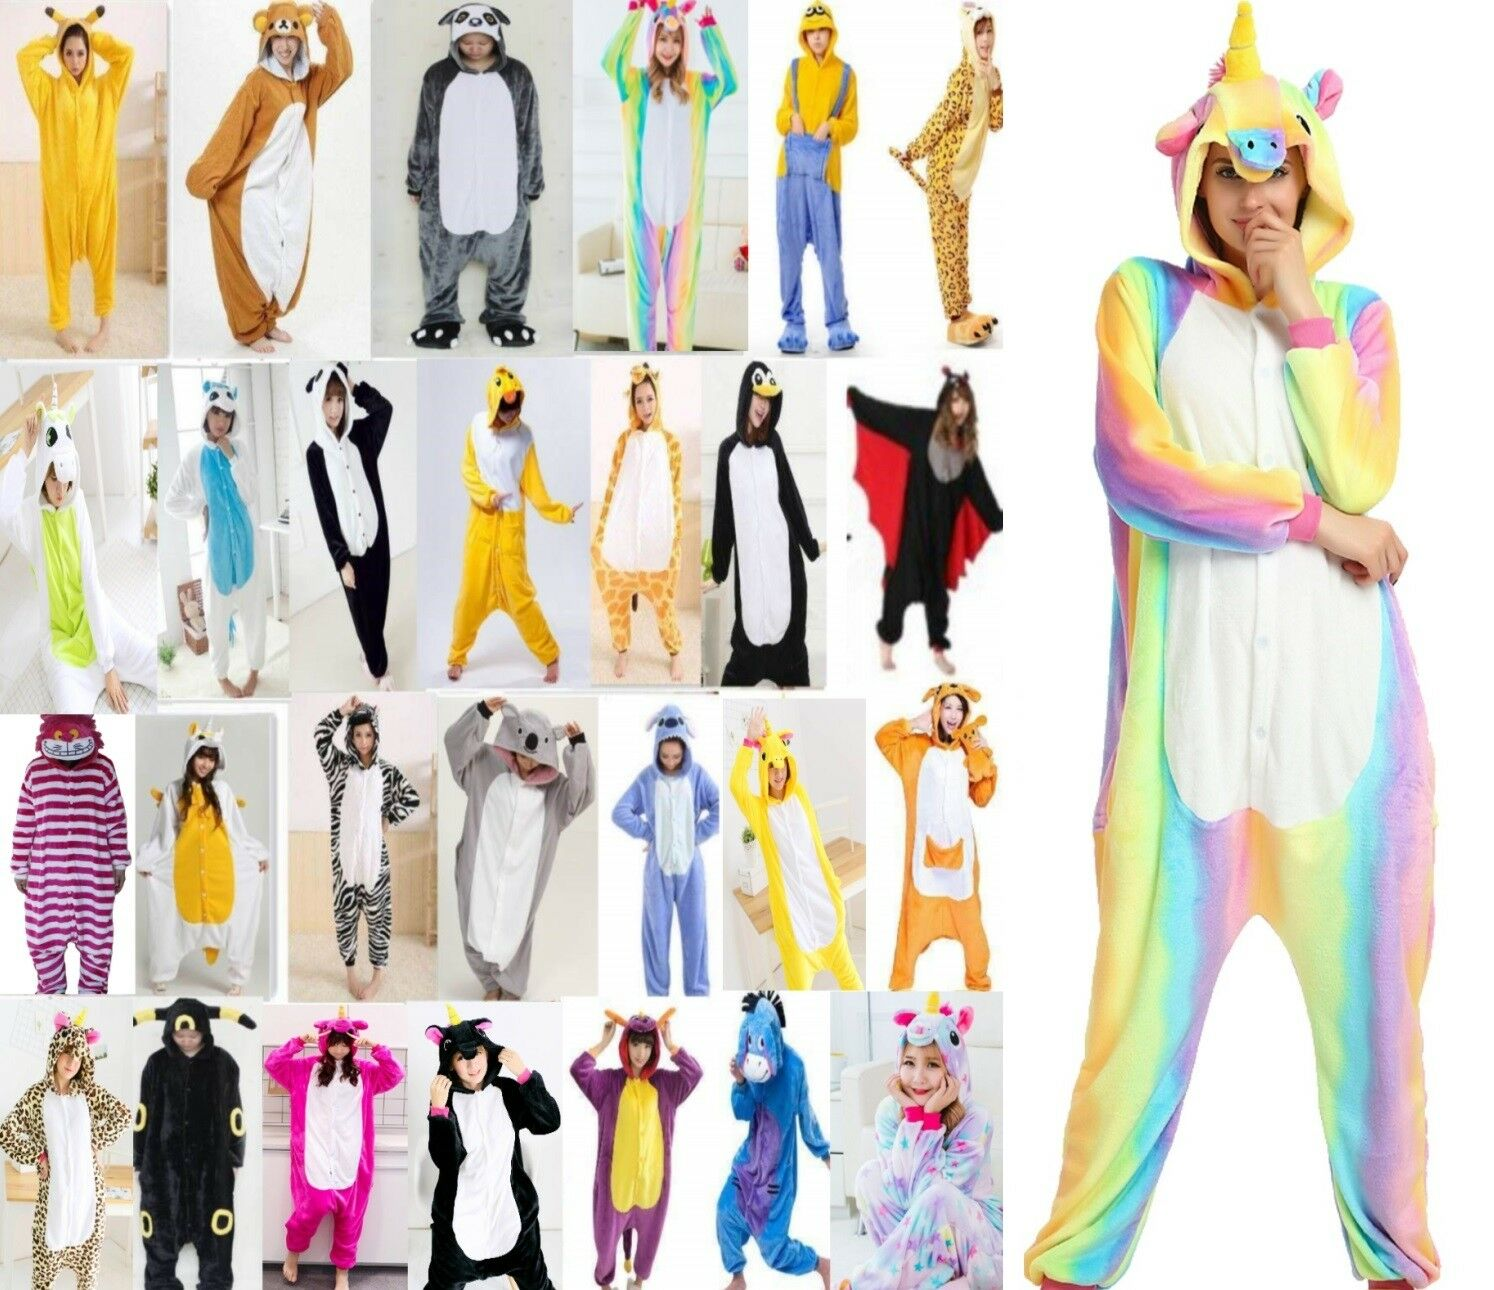 Pigiama kigurumi intero tuta carnevale feste animali zoo costume party Christmas 3